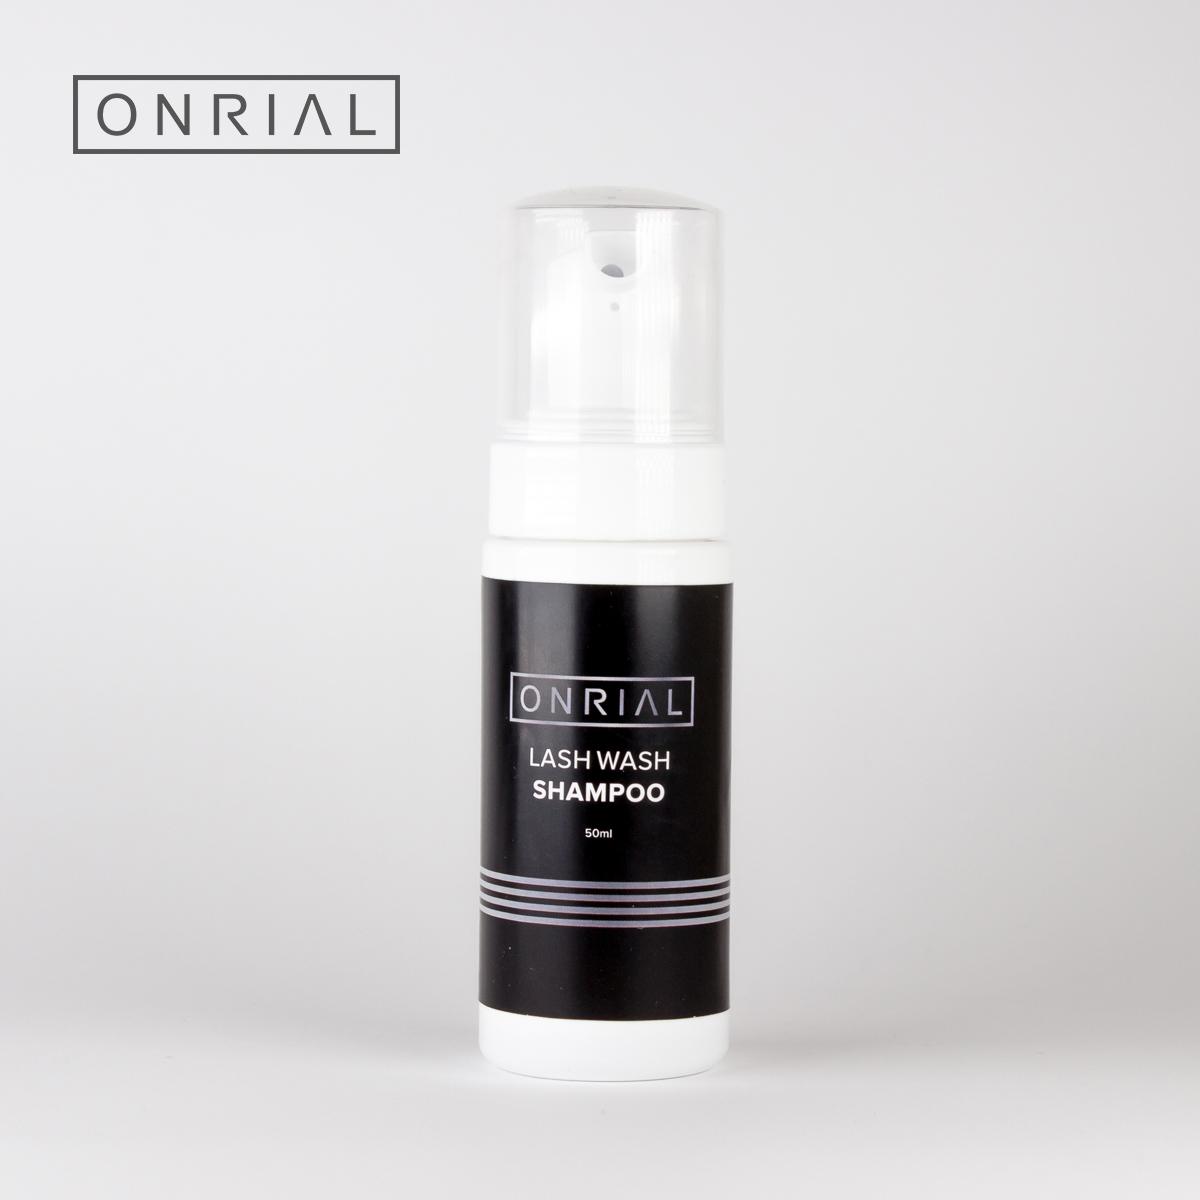 Шампунь по уходу за ресницами Lash Wash Shampoo Onrial